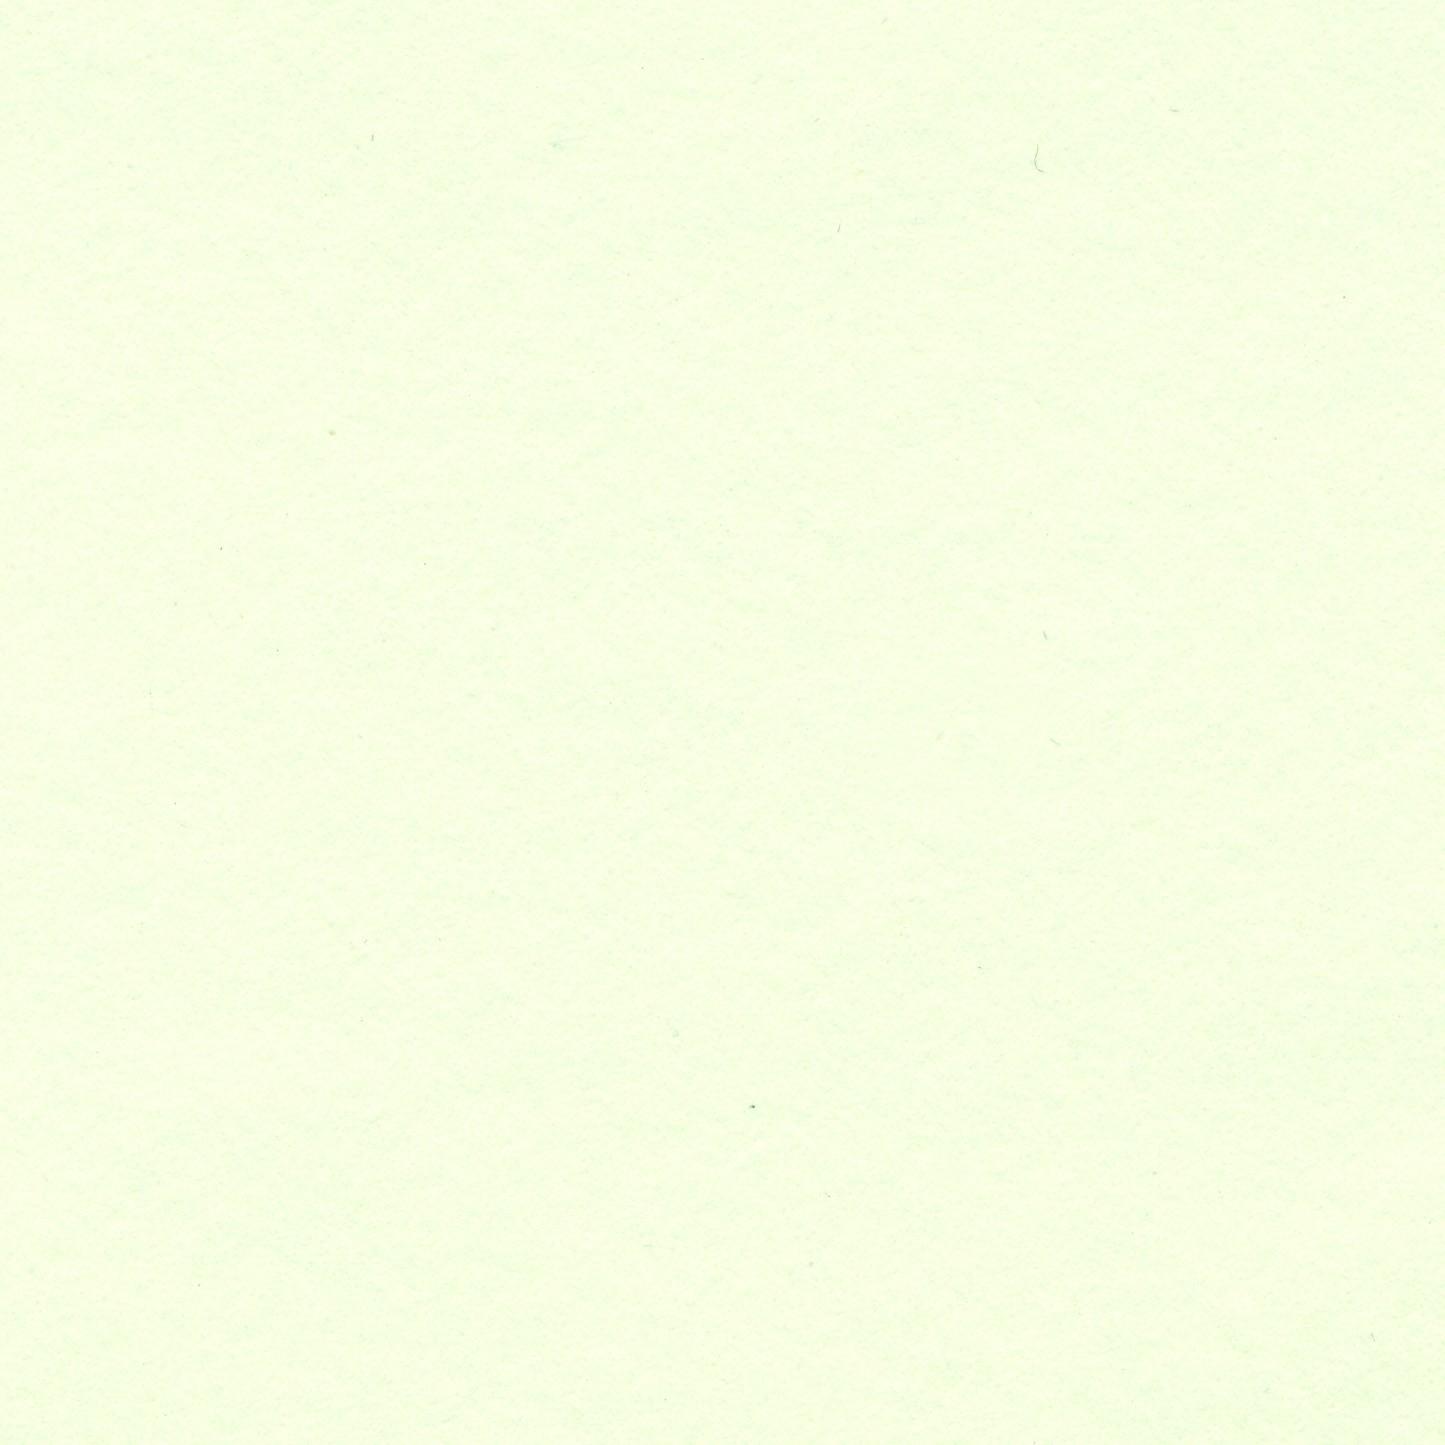 Green - Pistachio 135gsm